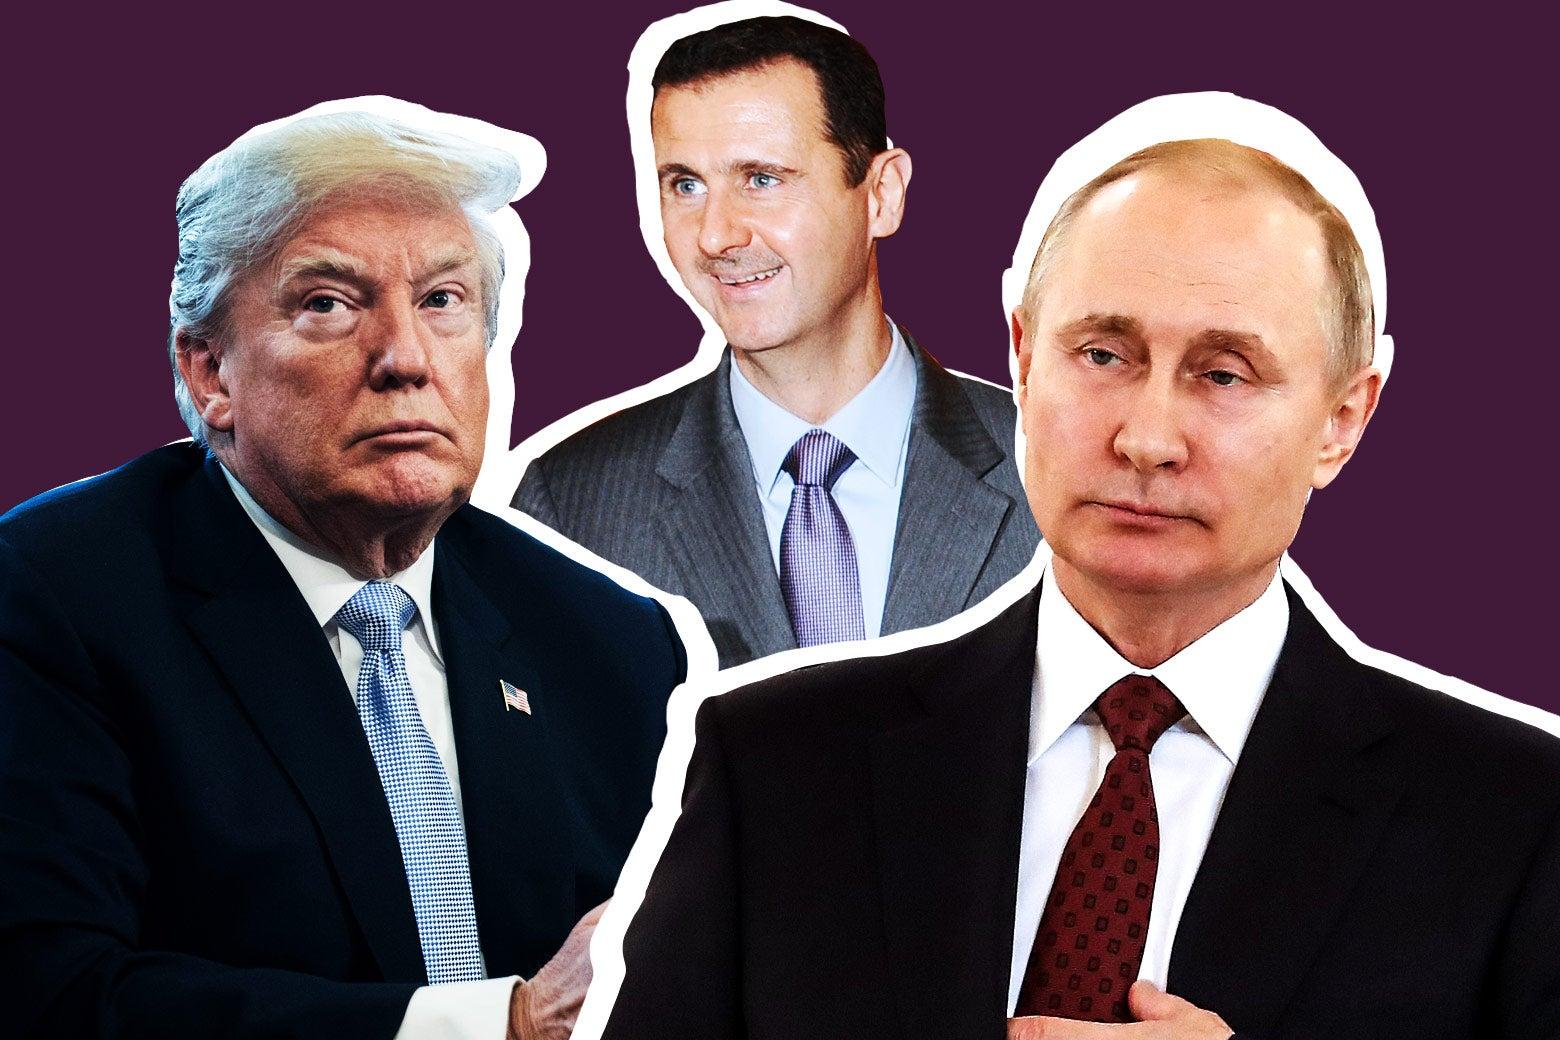 US President Donald Trump, Syrian President Bashar al-Assad, and Russian President Vladimir Putin